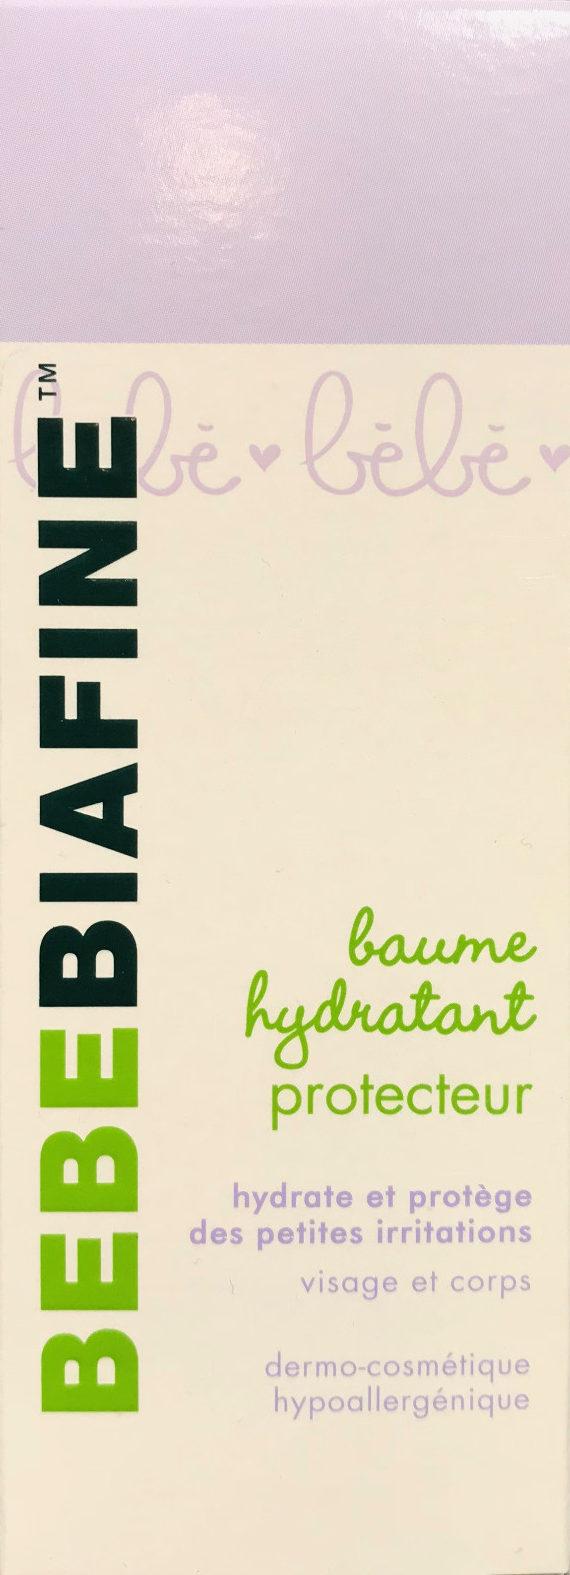 Baume hydratant protecteur - Product